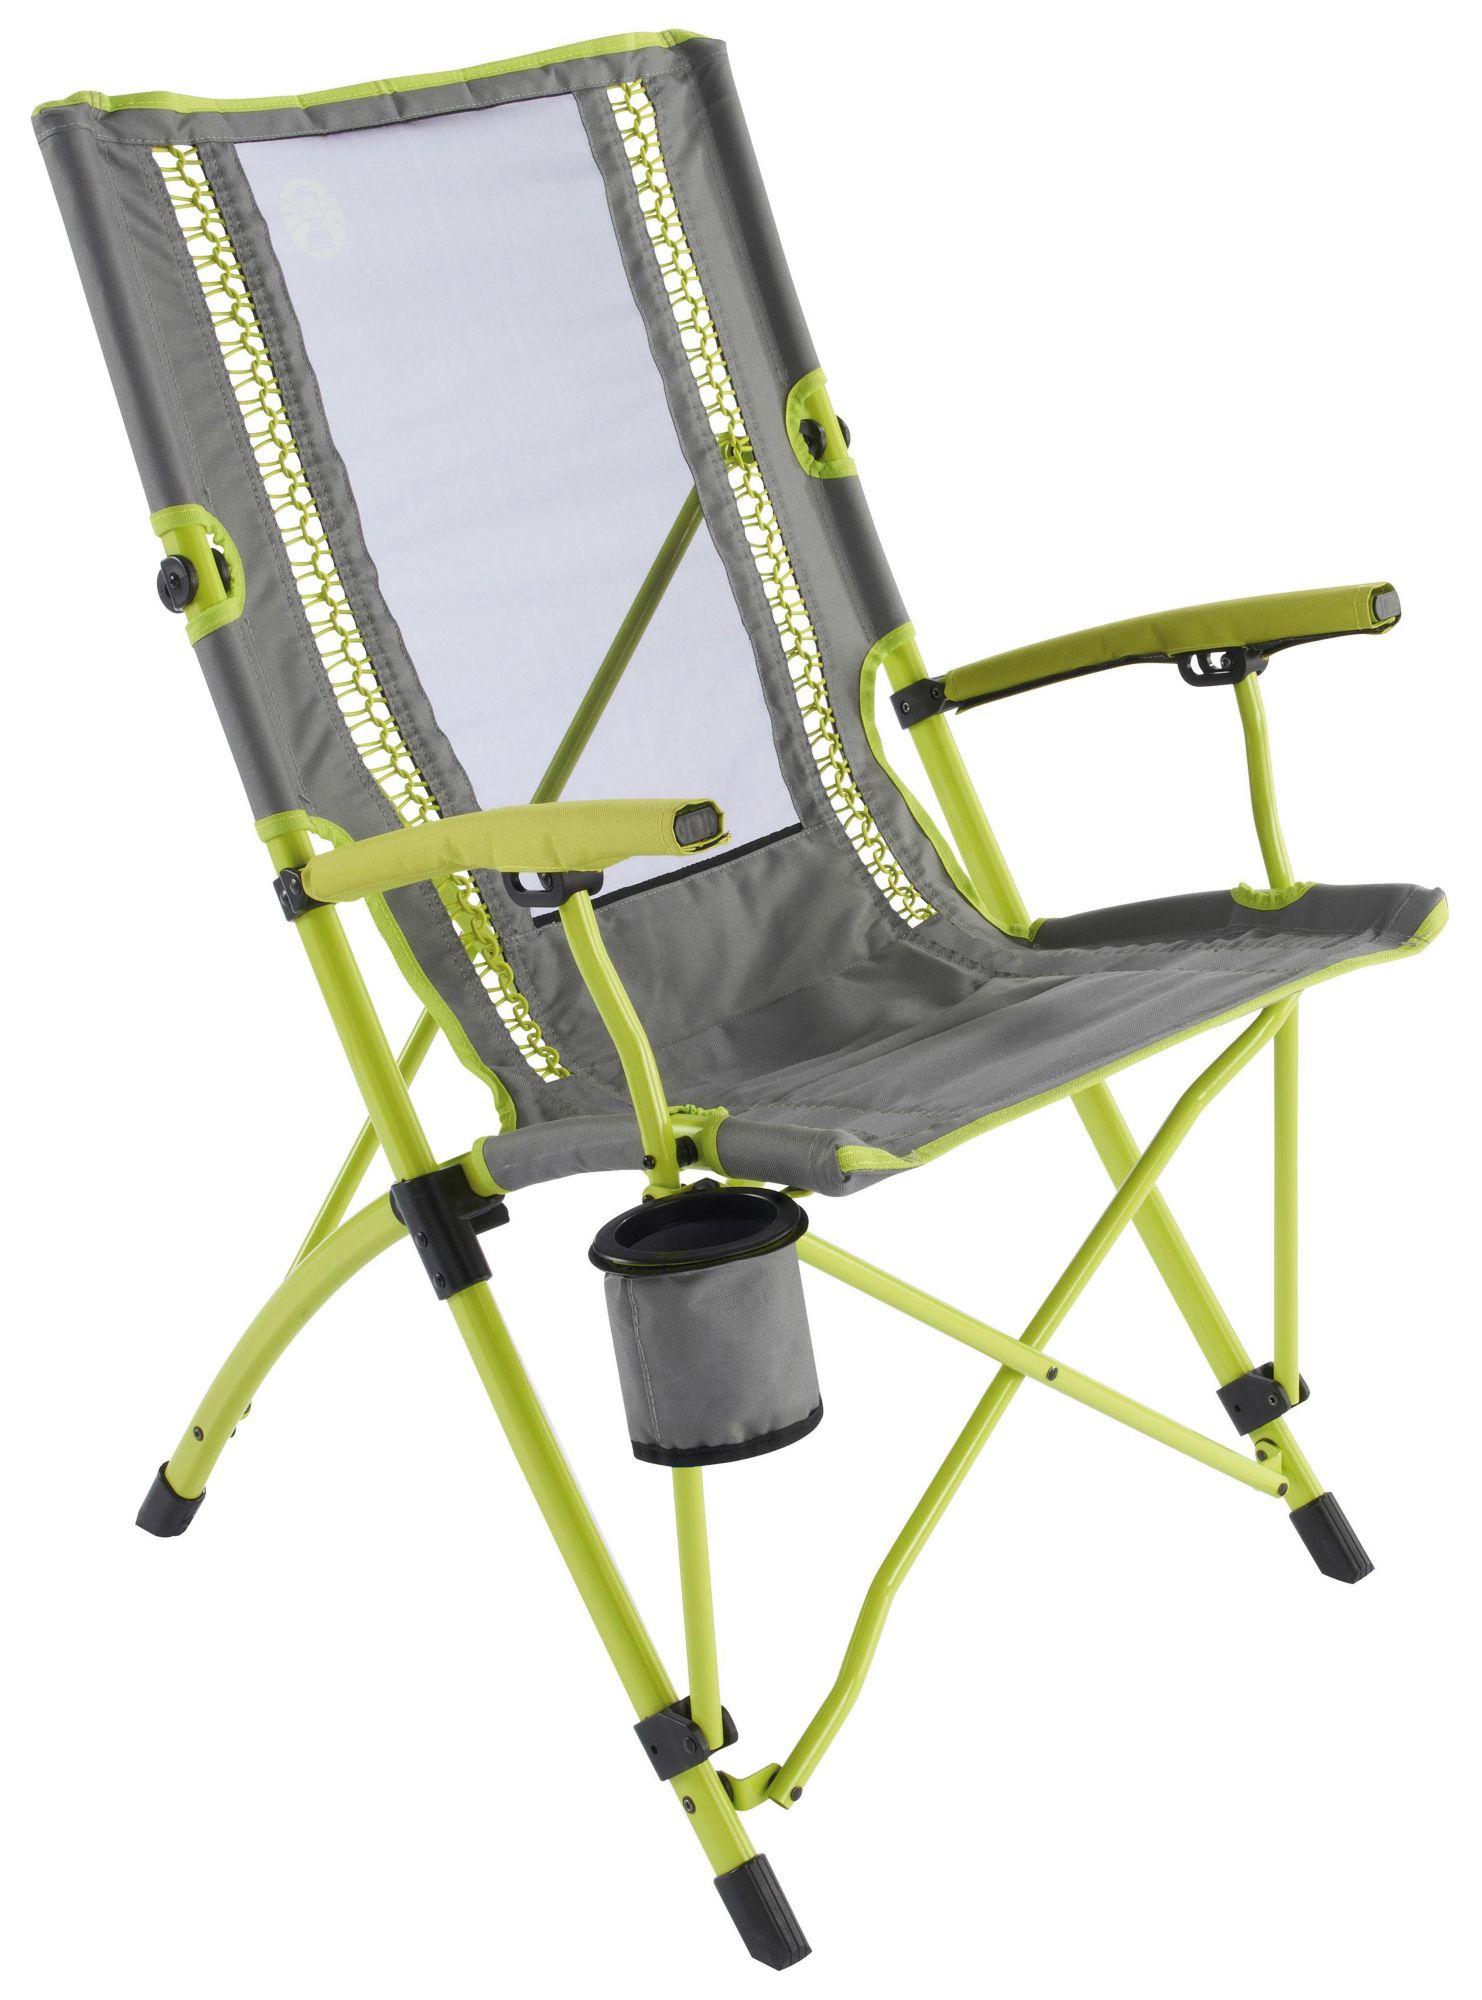 COLEMAN® Bungee Chair Blue 2000025548, Stuhl